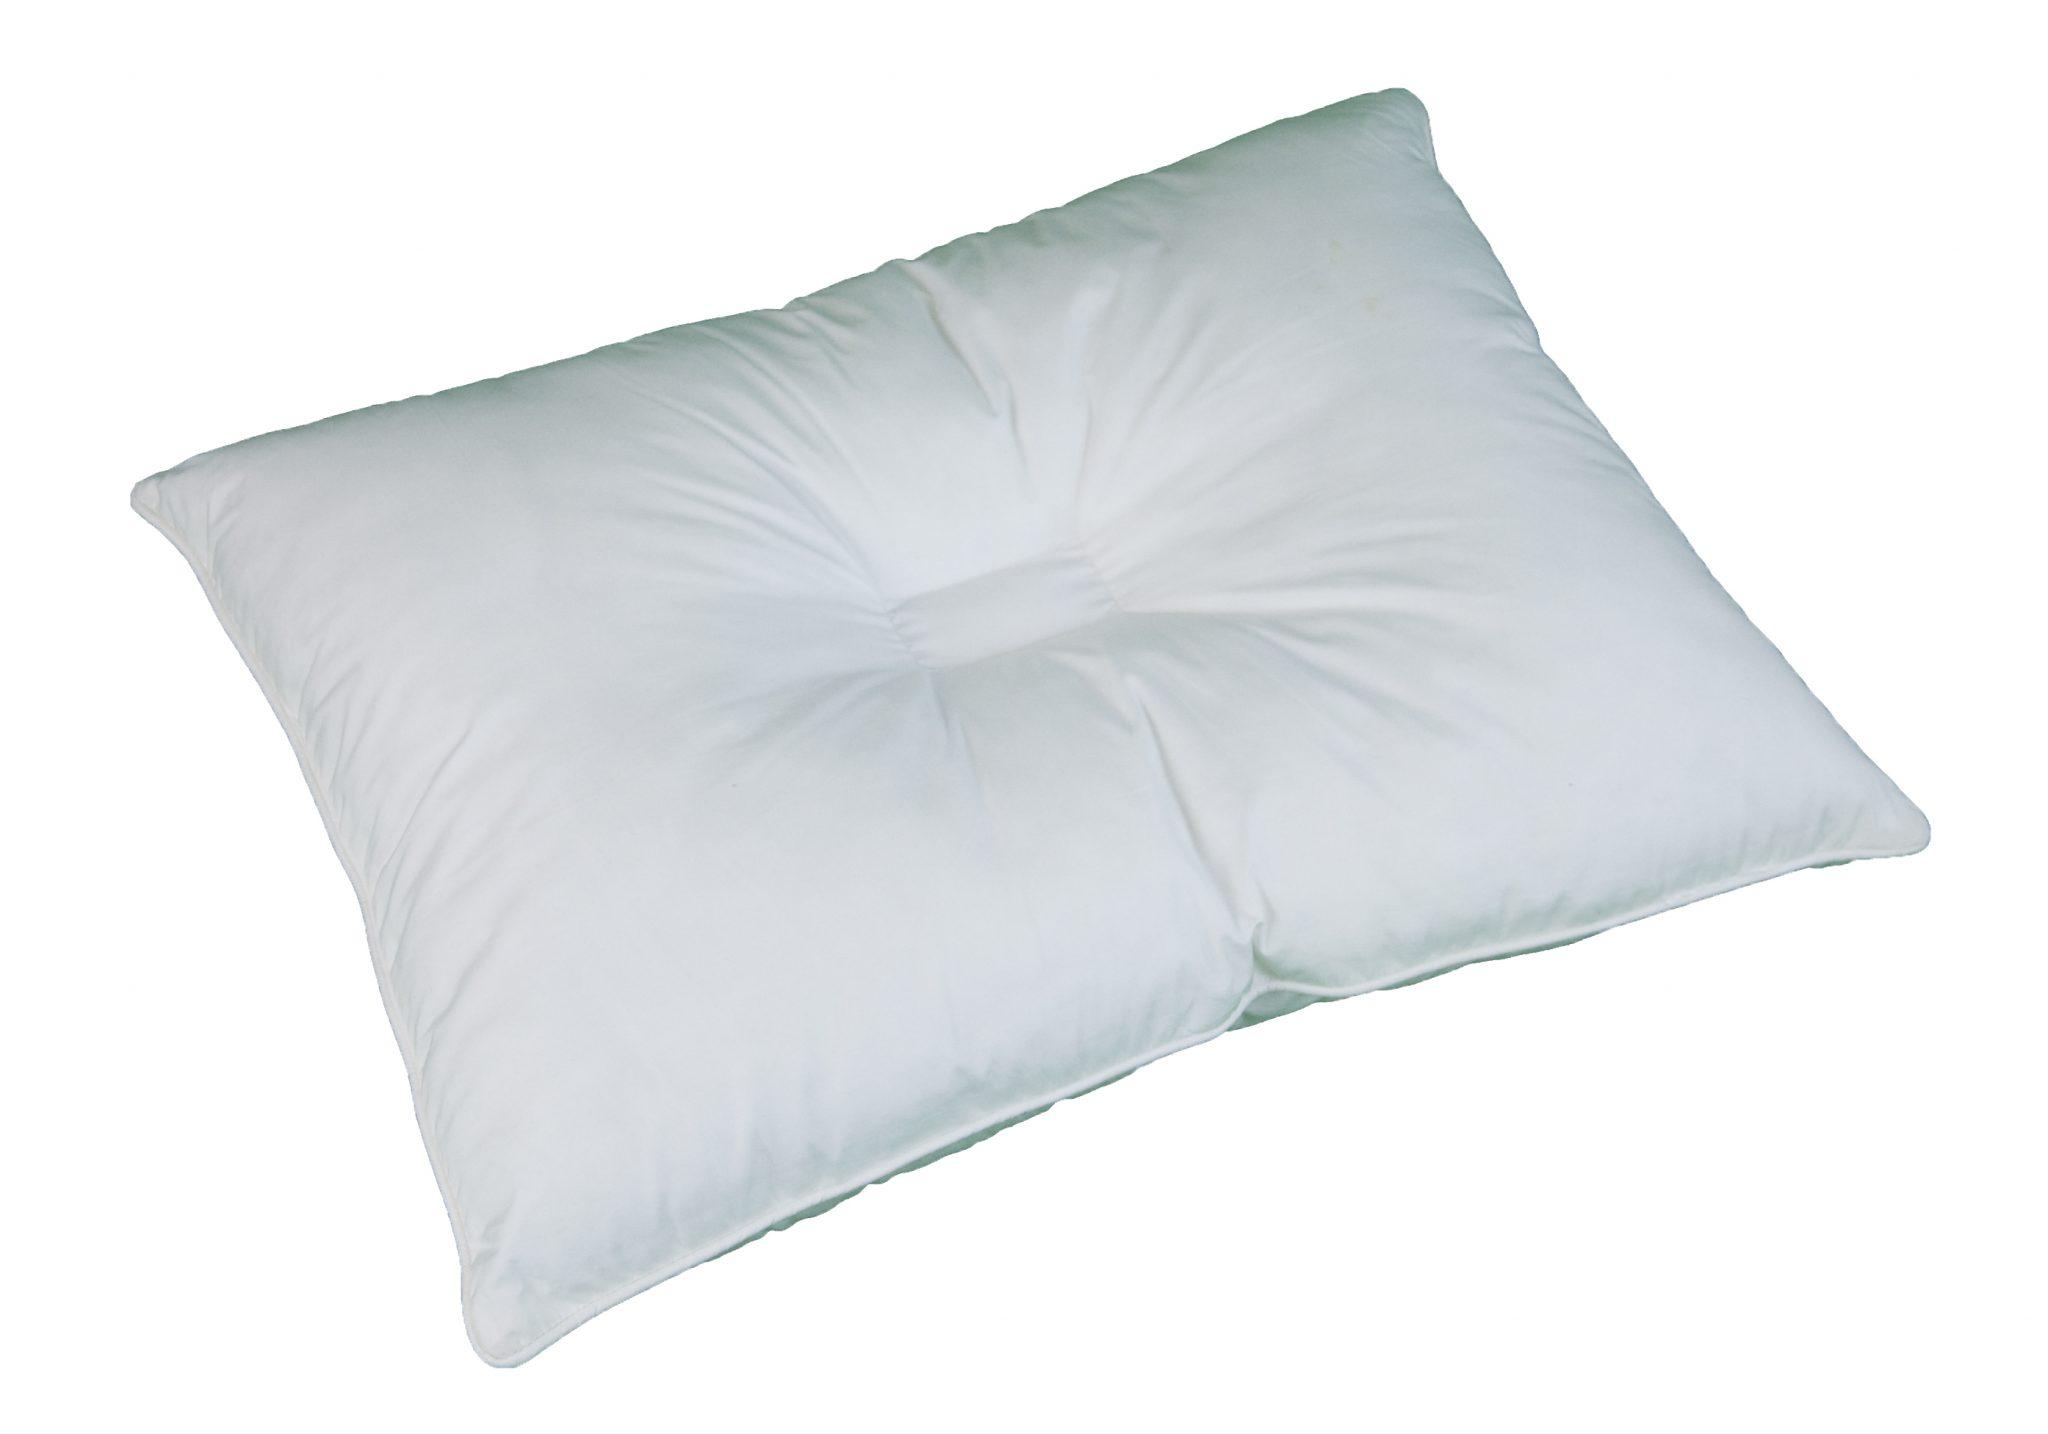 1 Hypoallergenic Microfiber Pillow Sleephi Collection